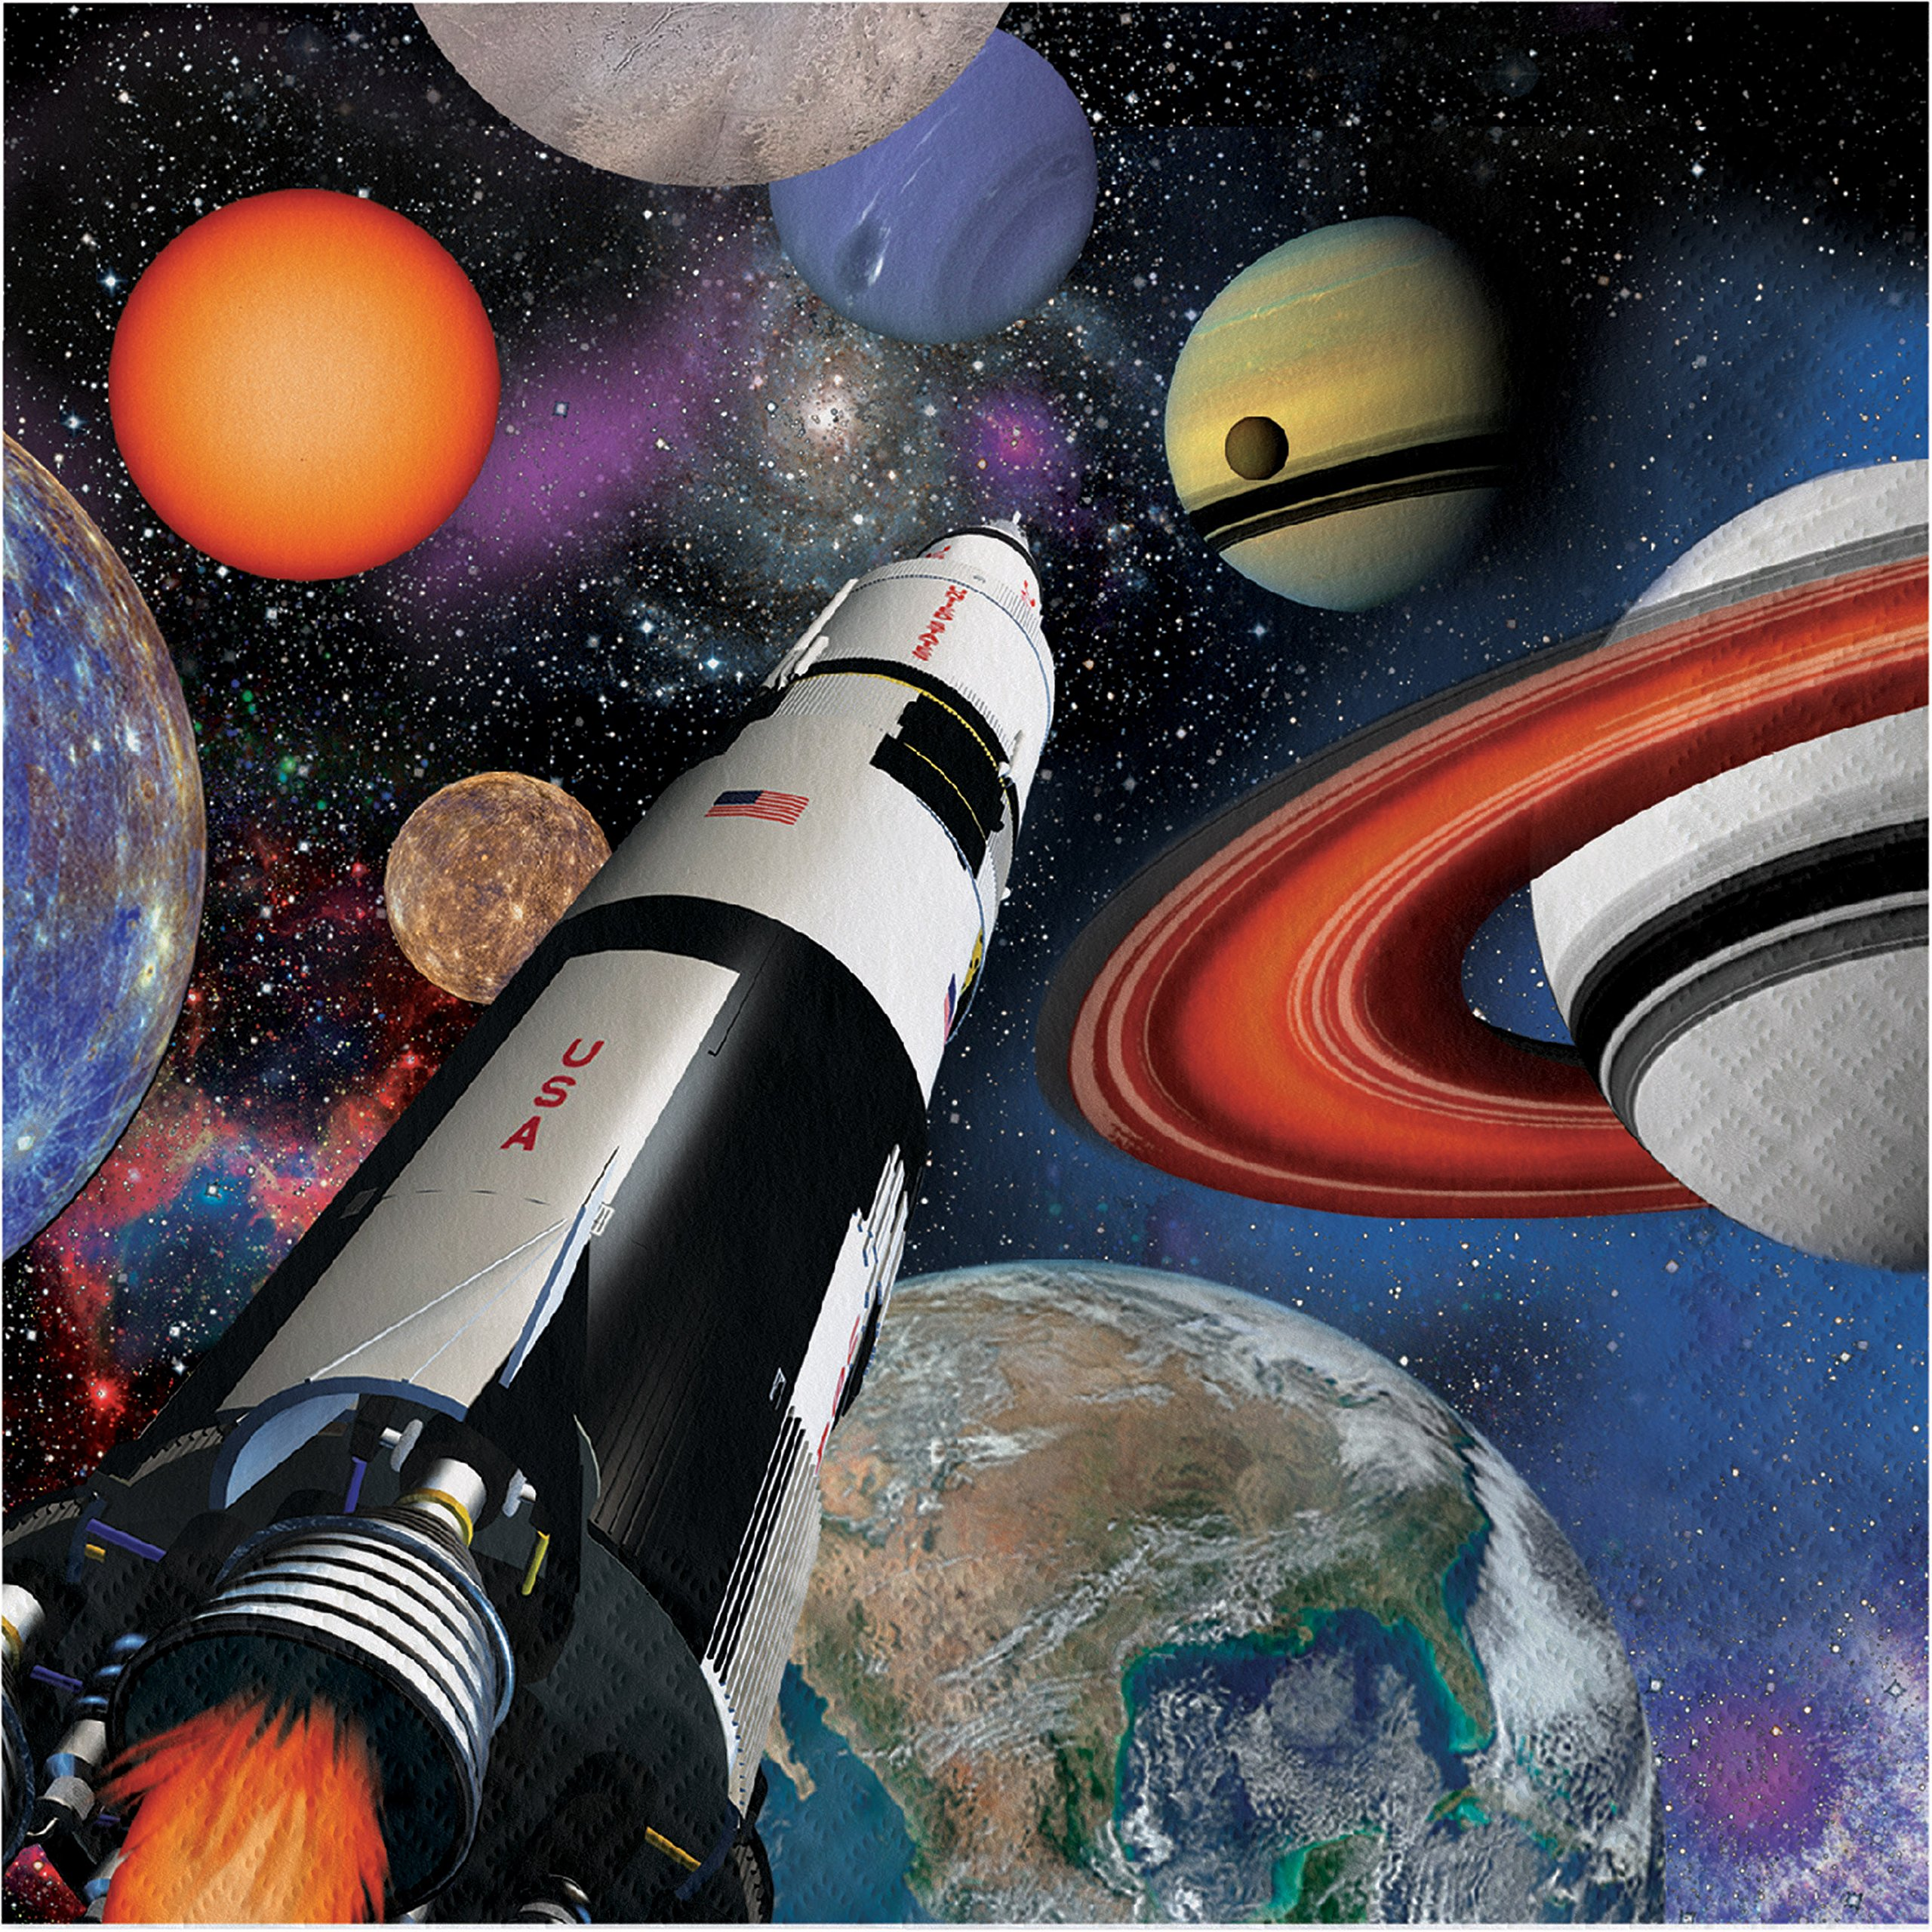 Space Blast Napkins, 48 ct